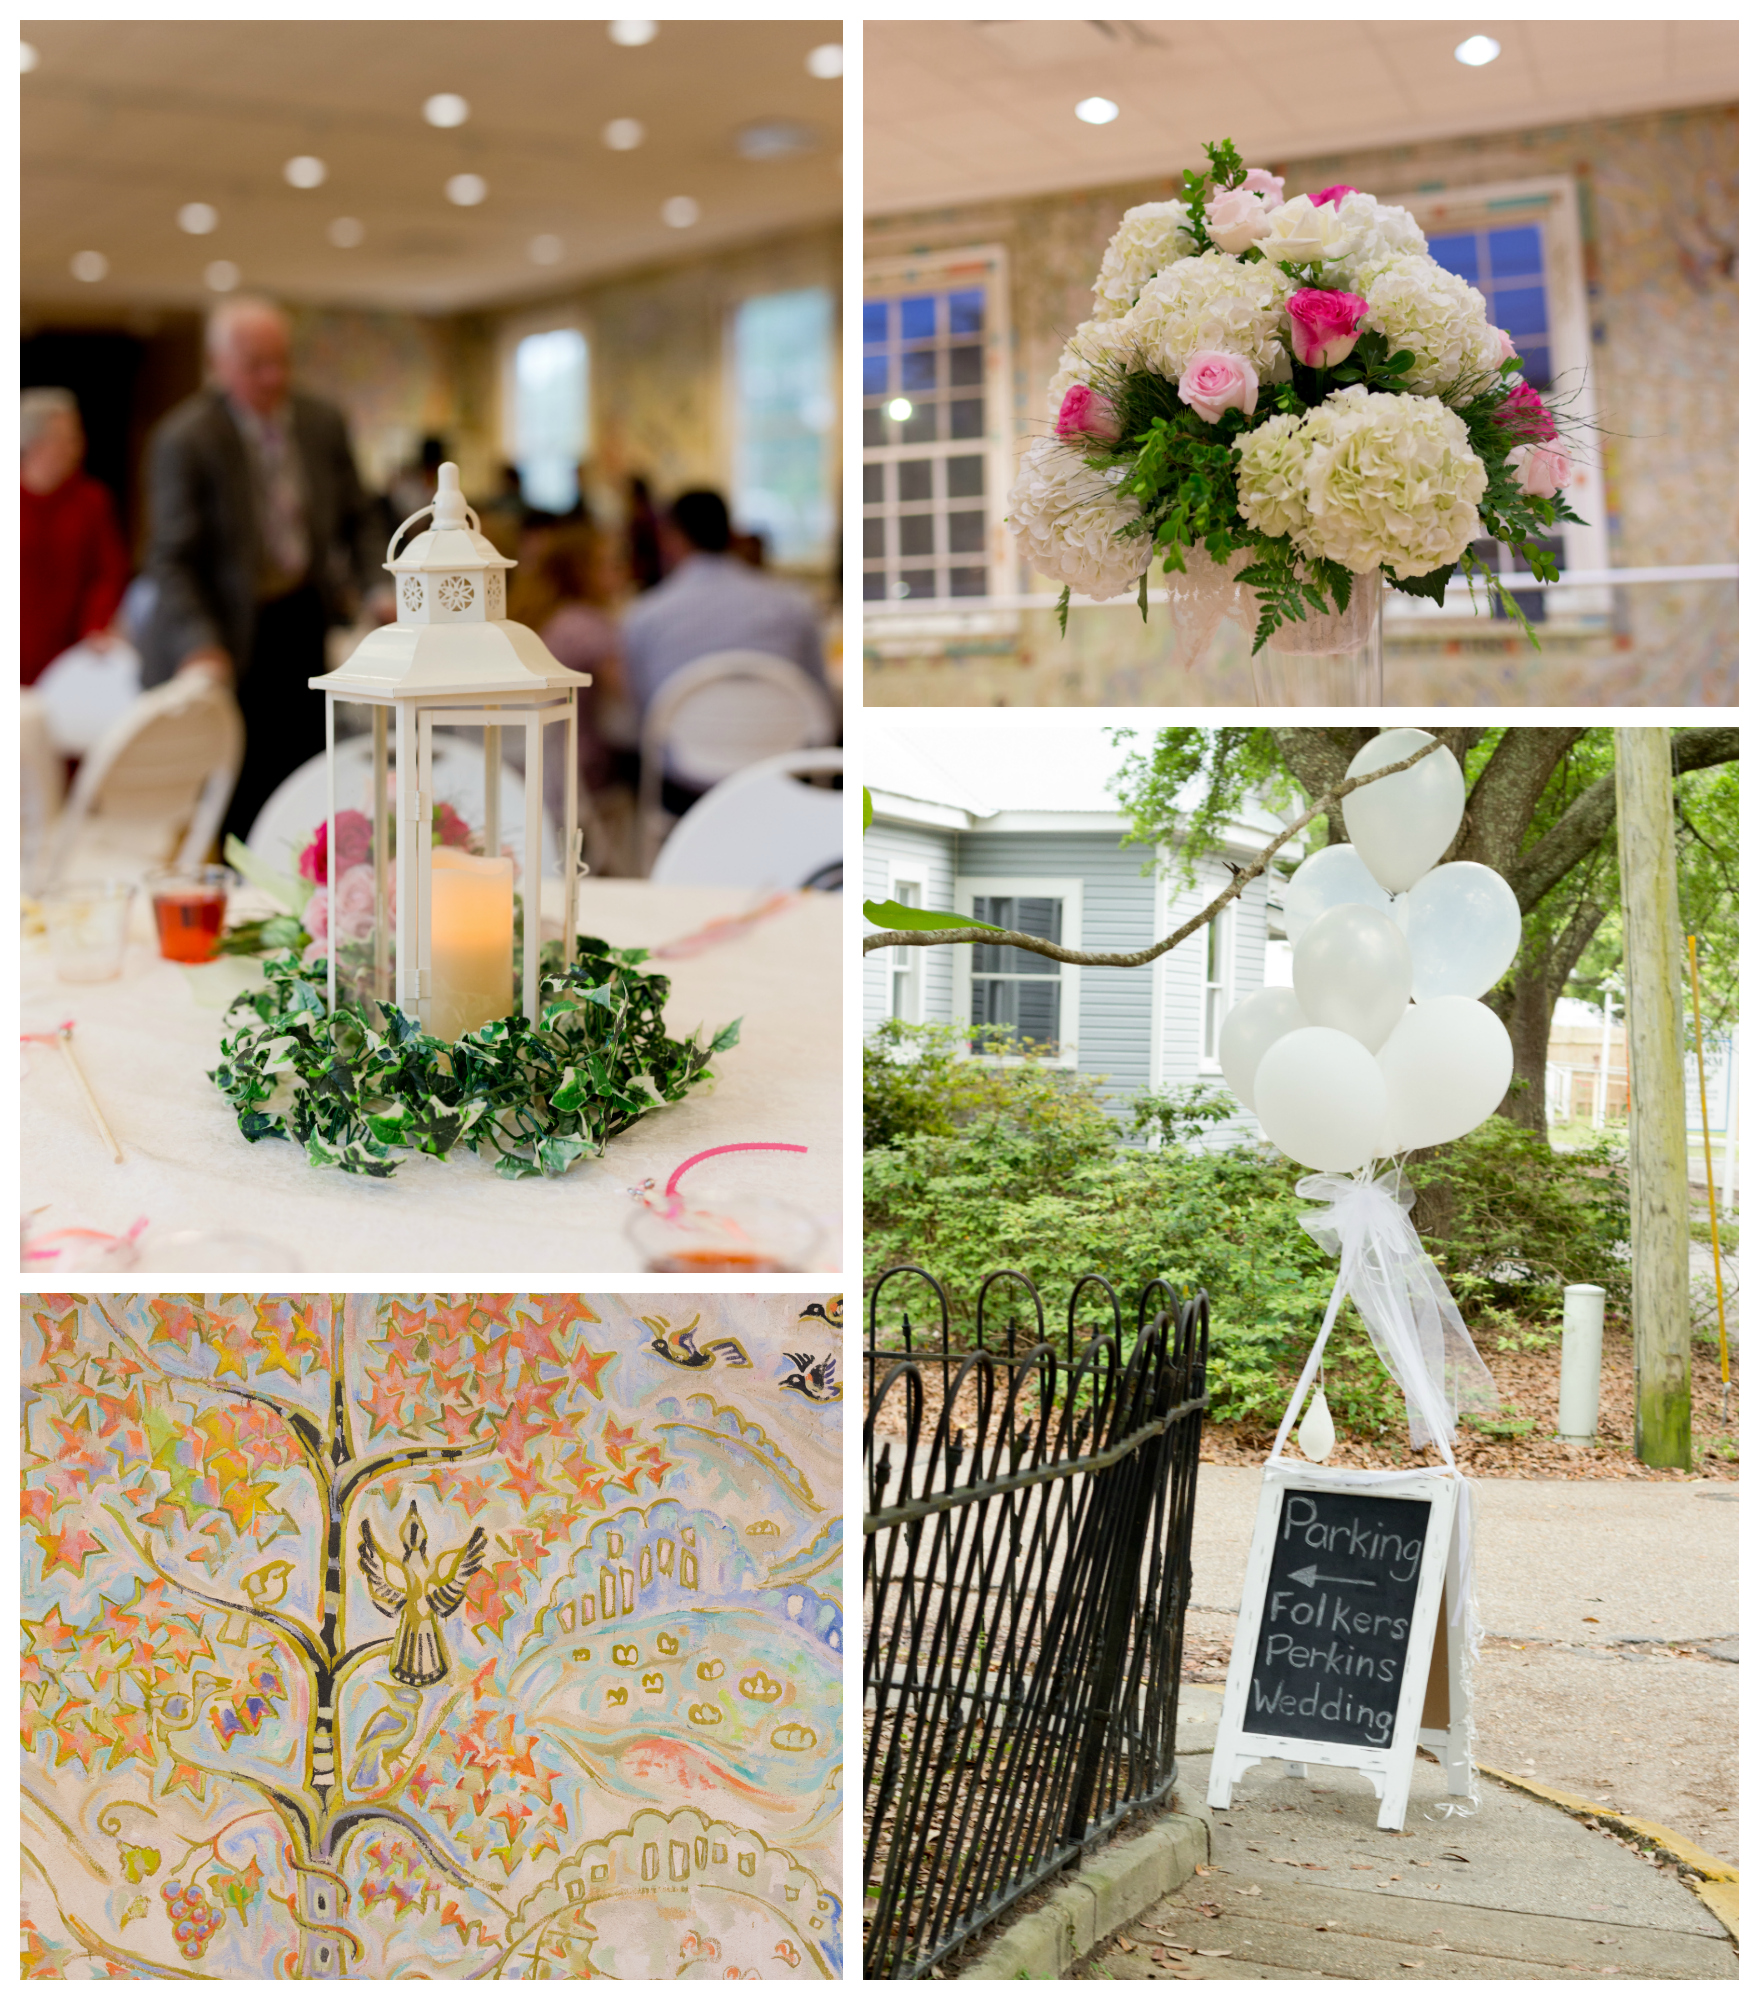 wedding reception decor at Ocean Springs Community Center